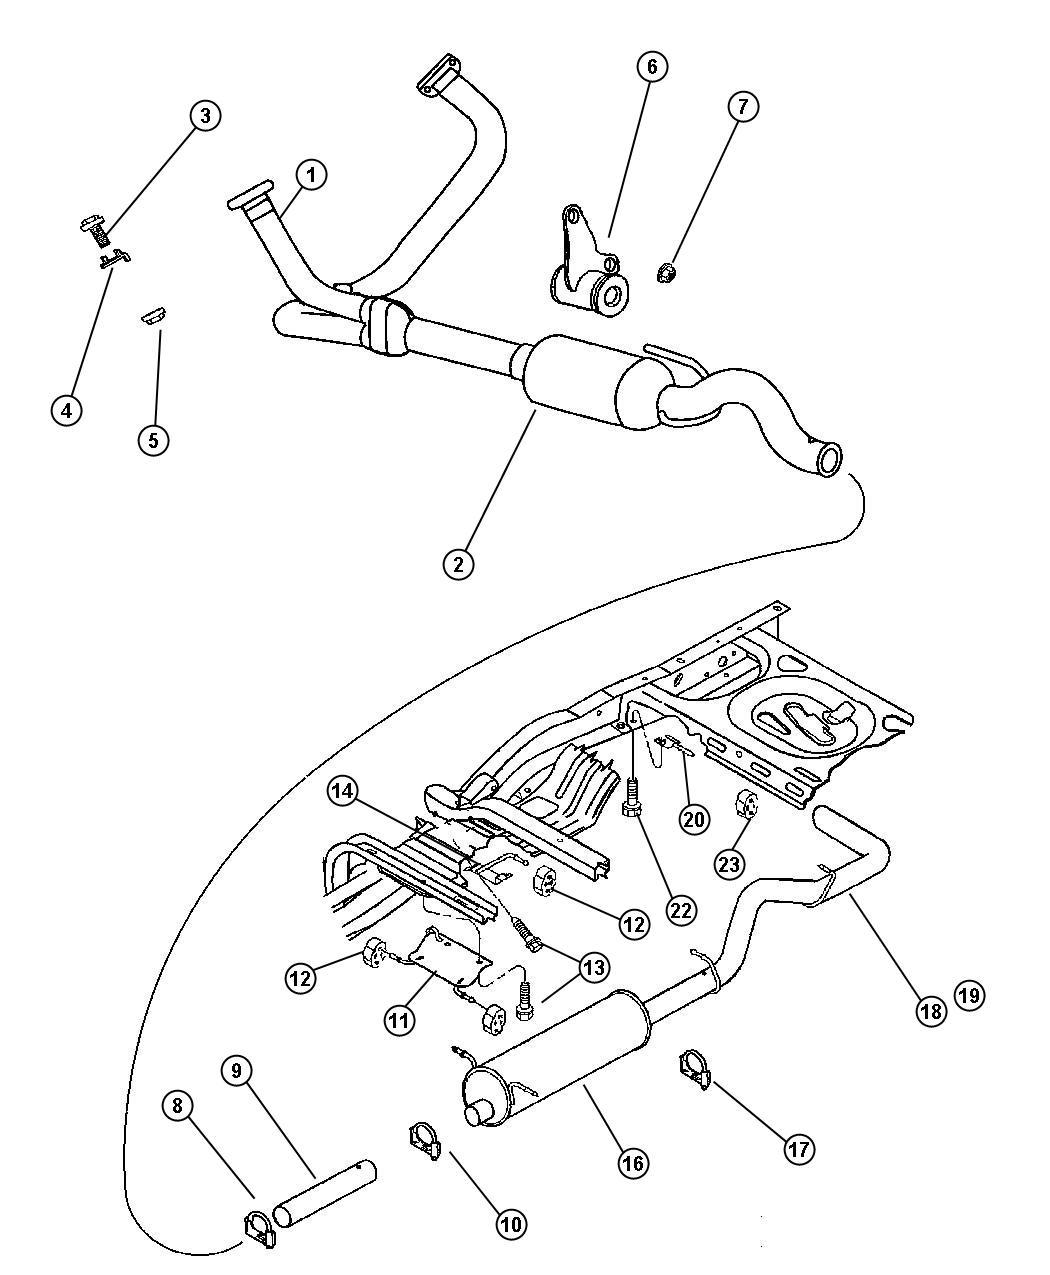 2001 Dodge Dakotum Exhaust Diagram